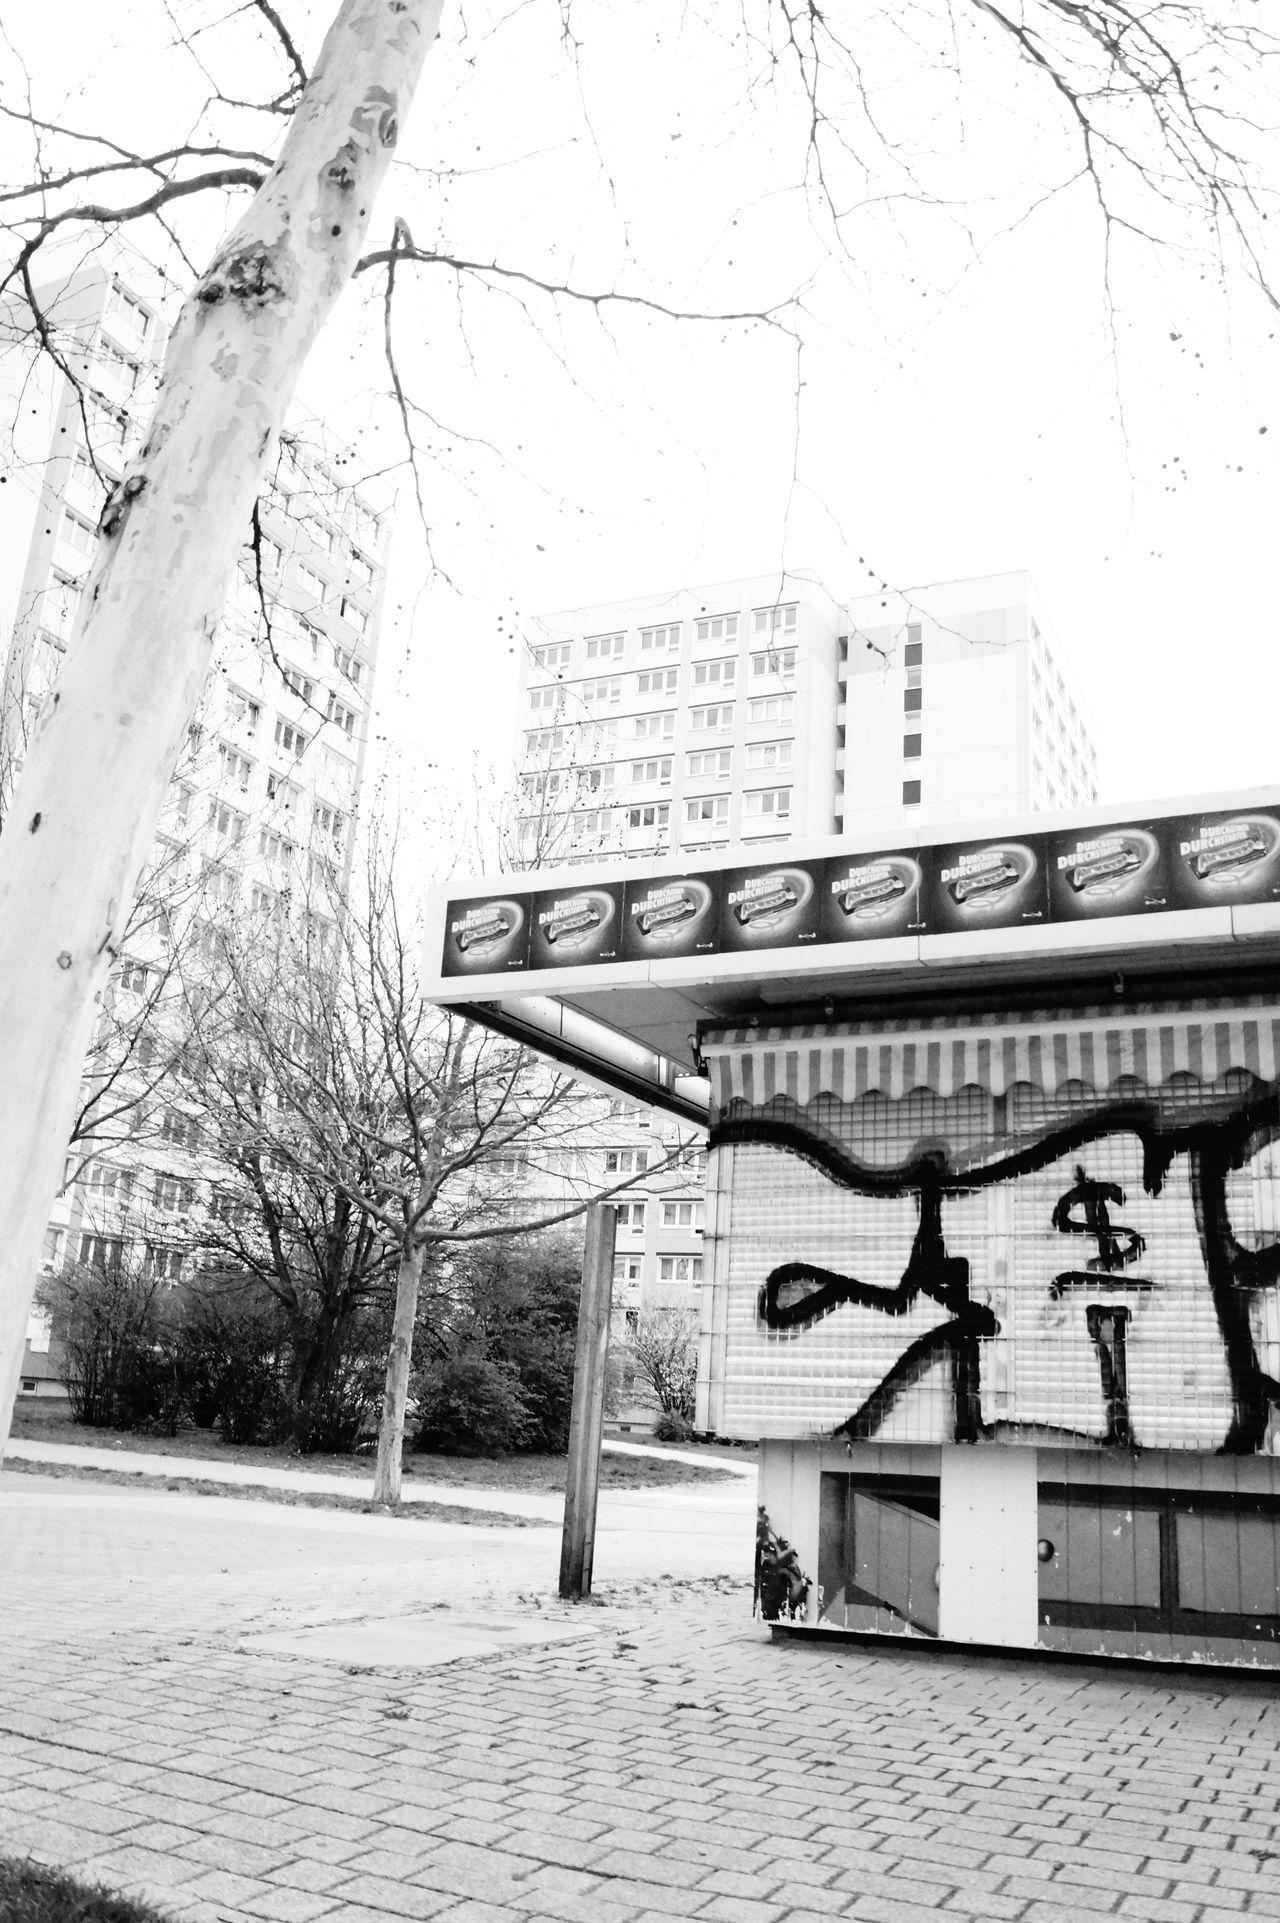 Art Blackandwhite Creativity Eastgermany Ghetto Graffiti Wall First Eyeem Photo